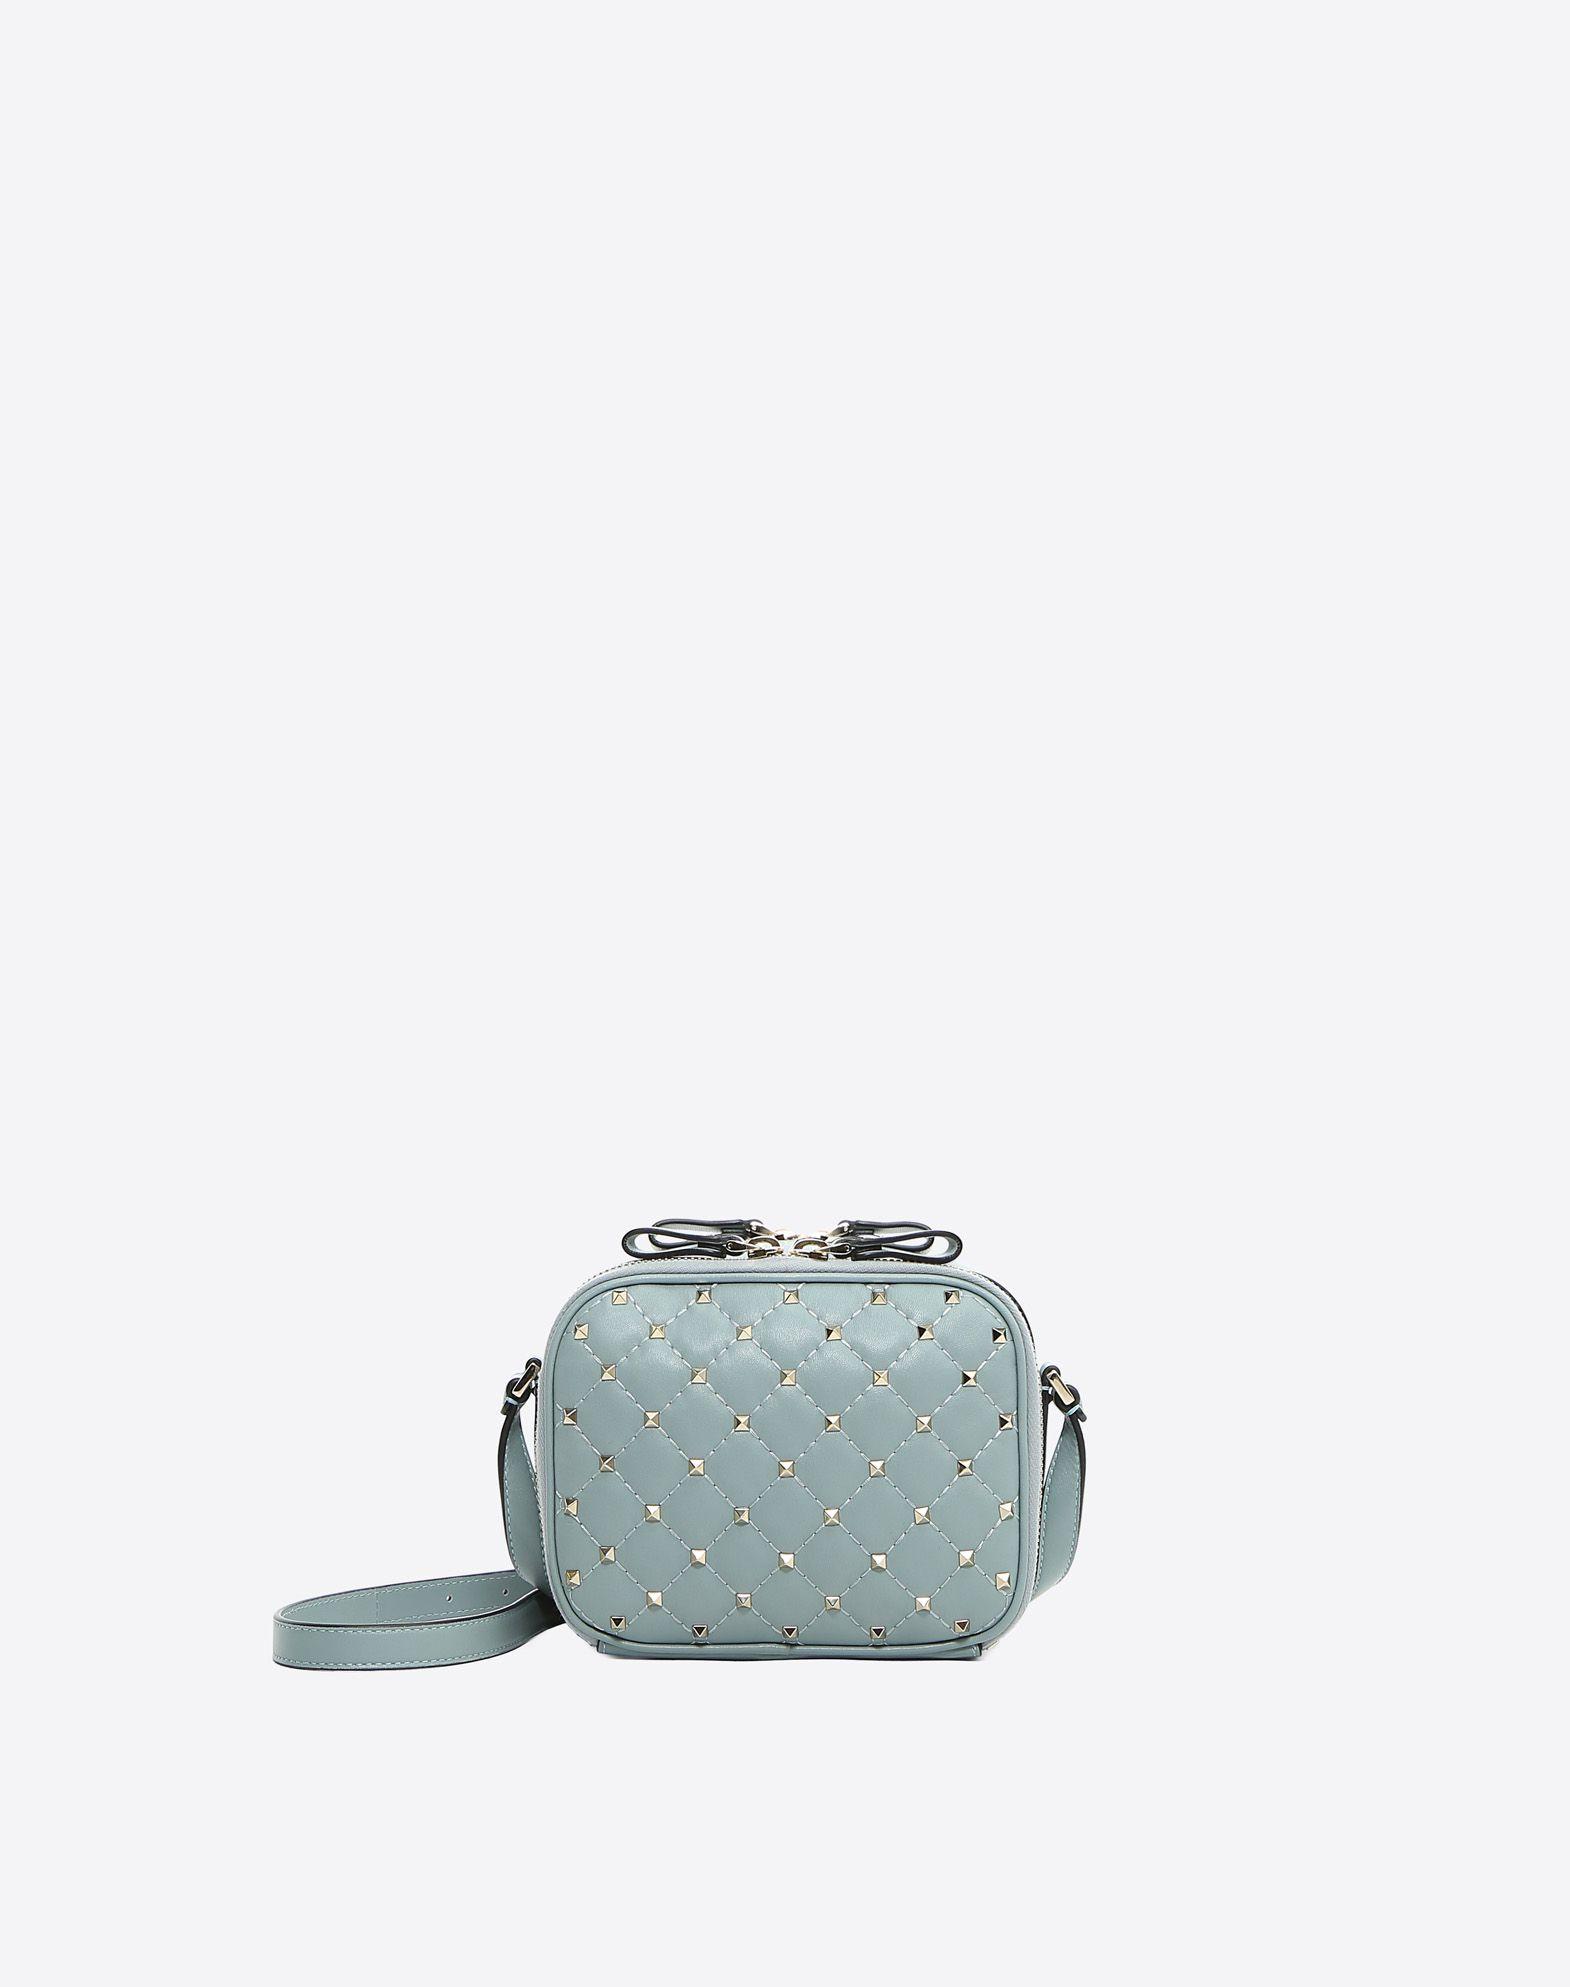 Rockstud Spike Crossbody Bag in Green Nappa Leather Valentino DAaZCx